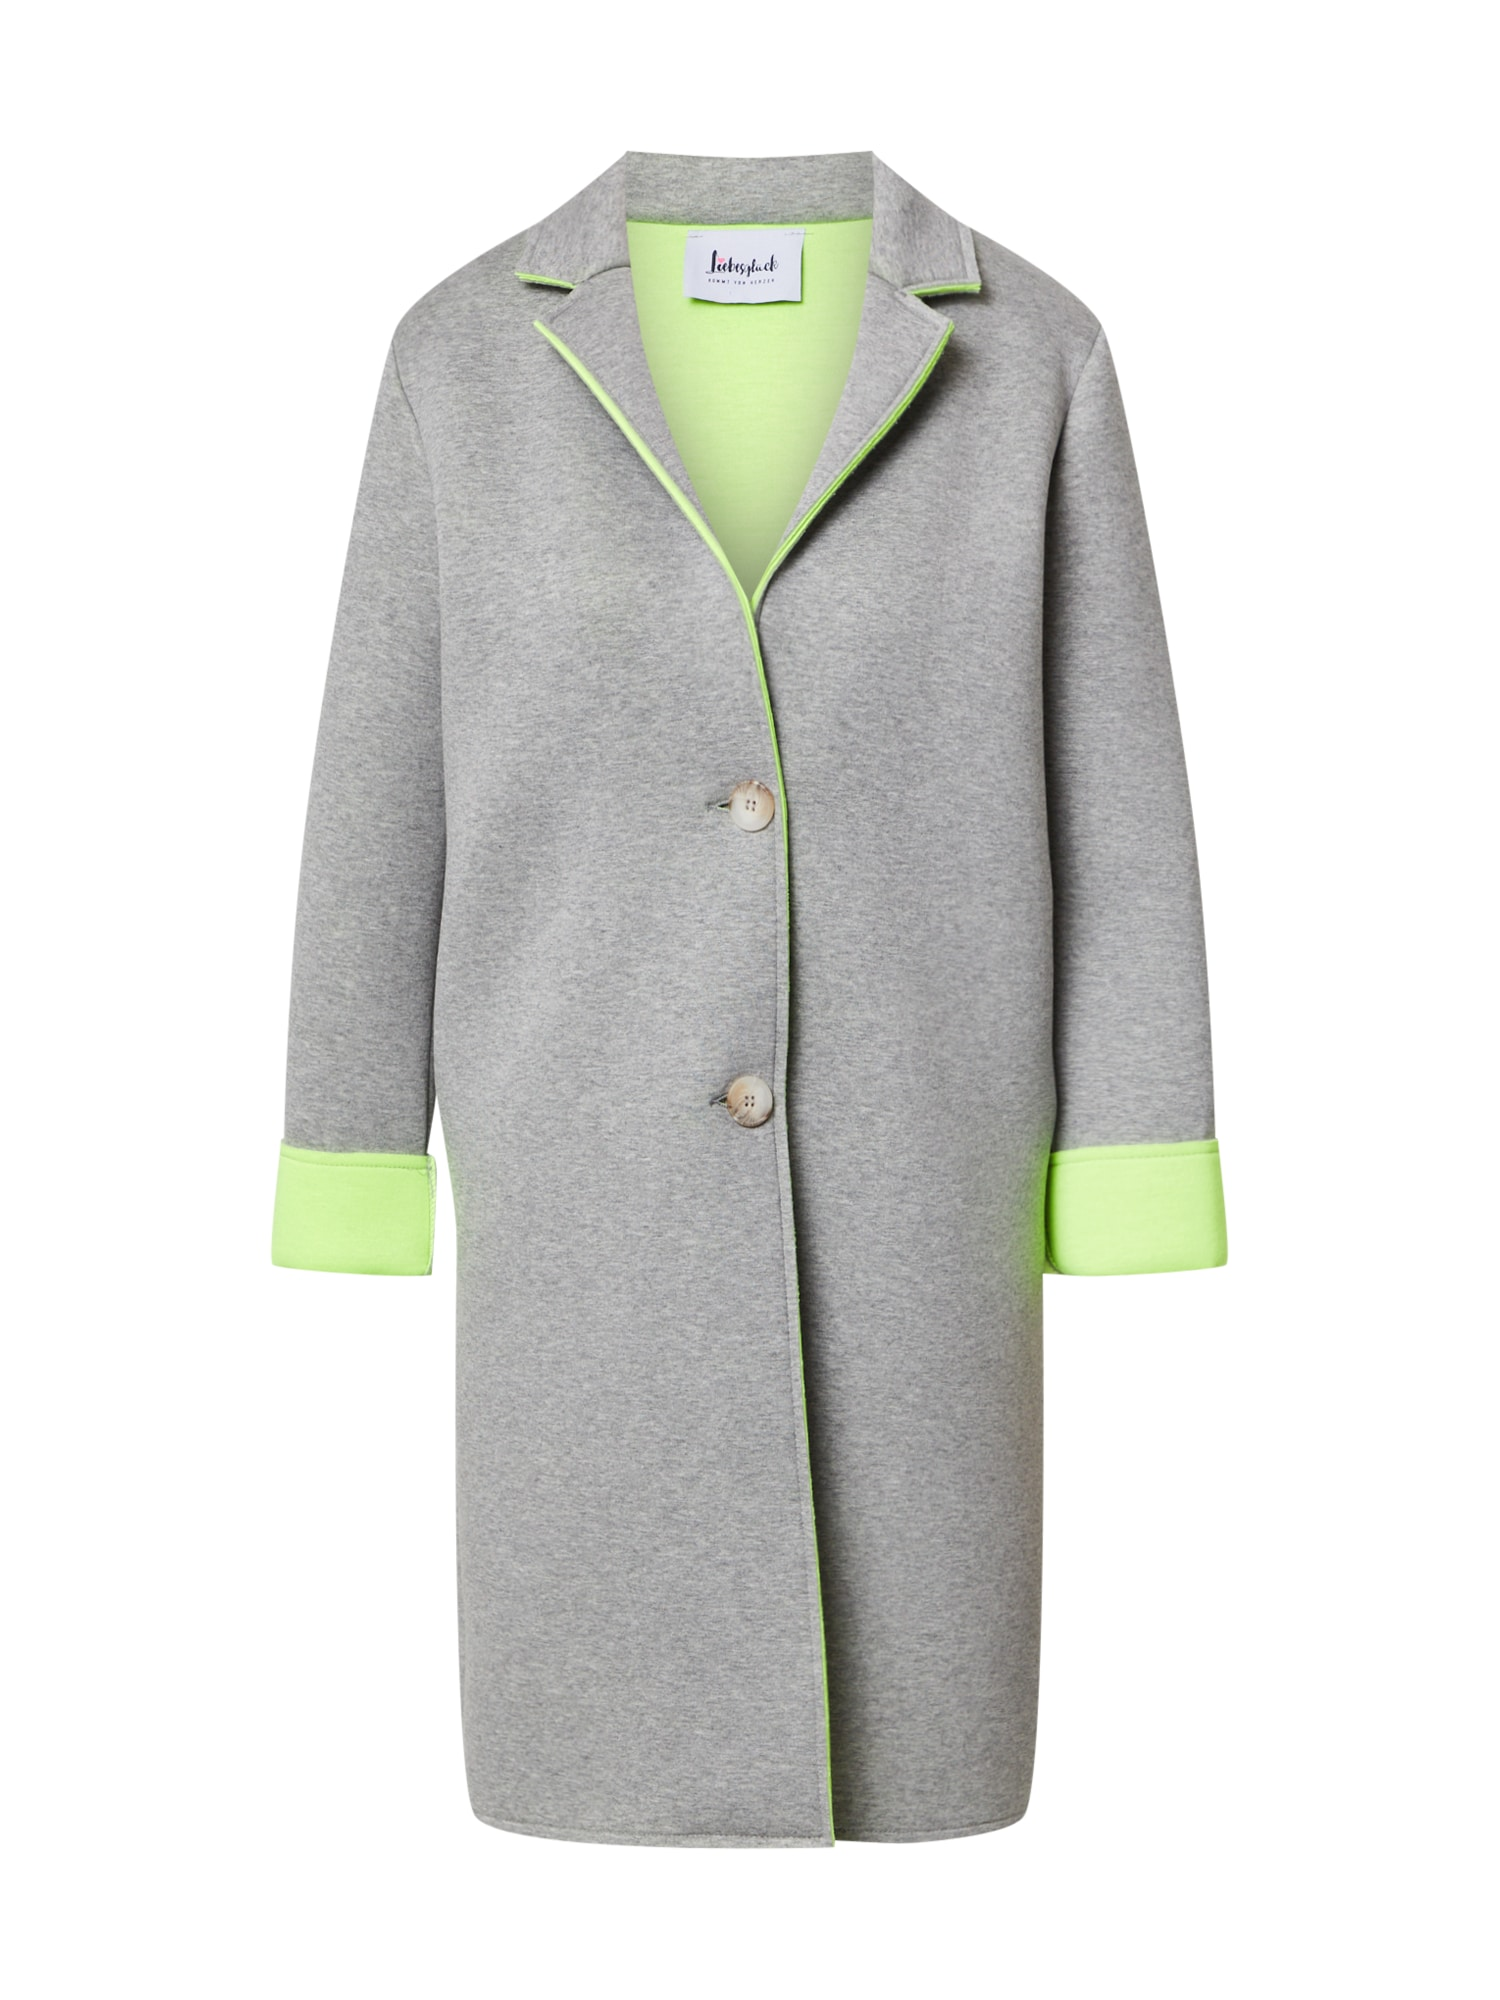 Liebesglück Rudeninis-žieminis paltas margai pilka